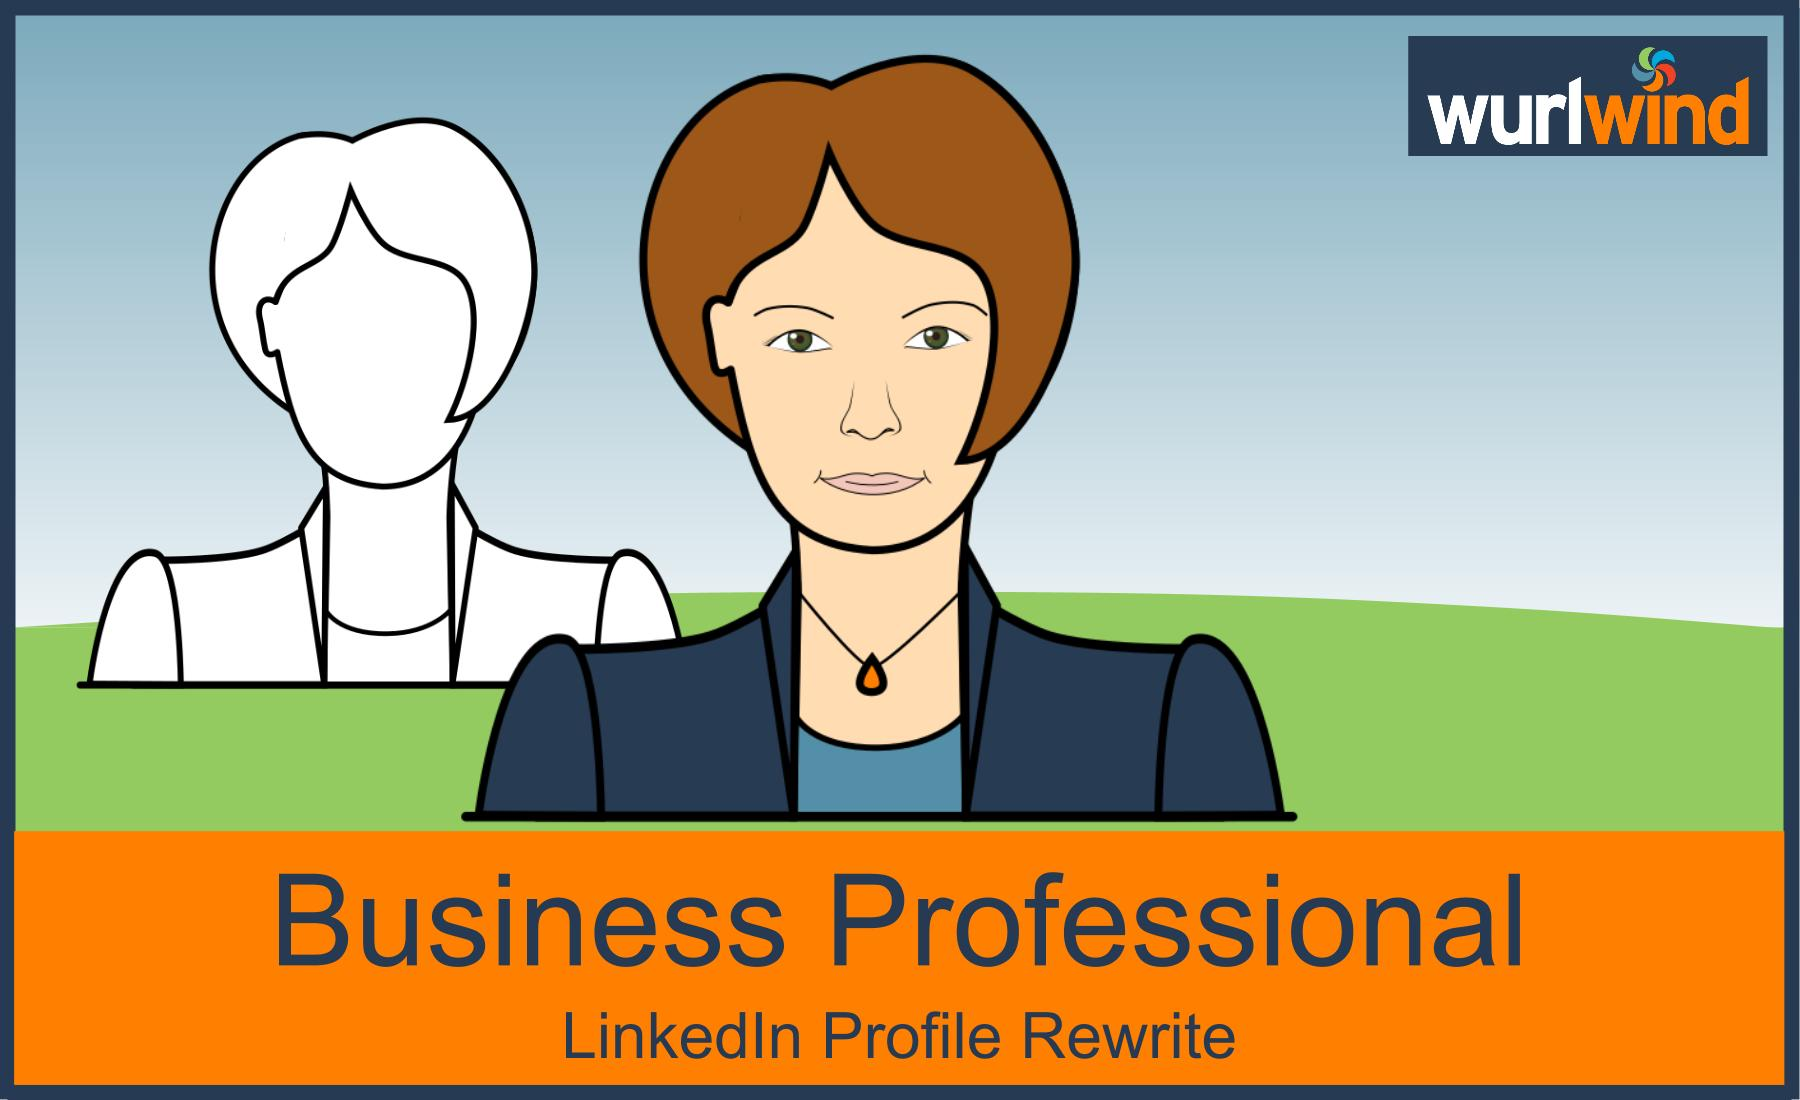 LinkedIn Profile Rewrite Business Professional Image Mark Stonham Wurlwind